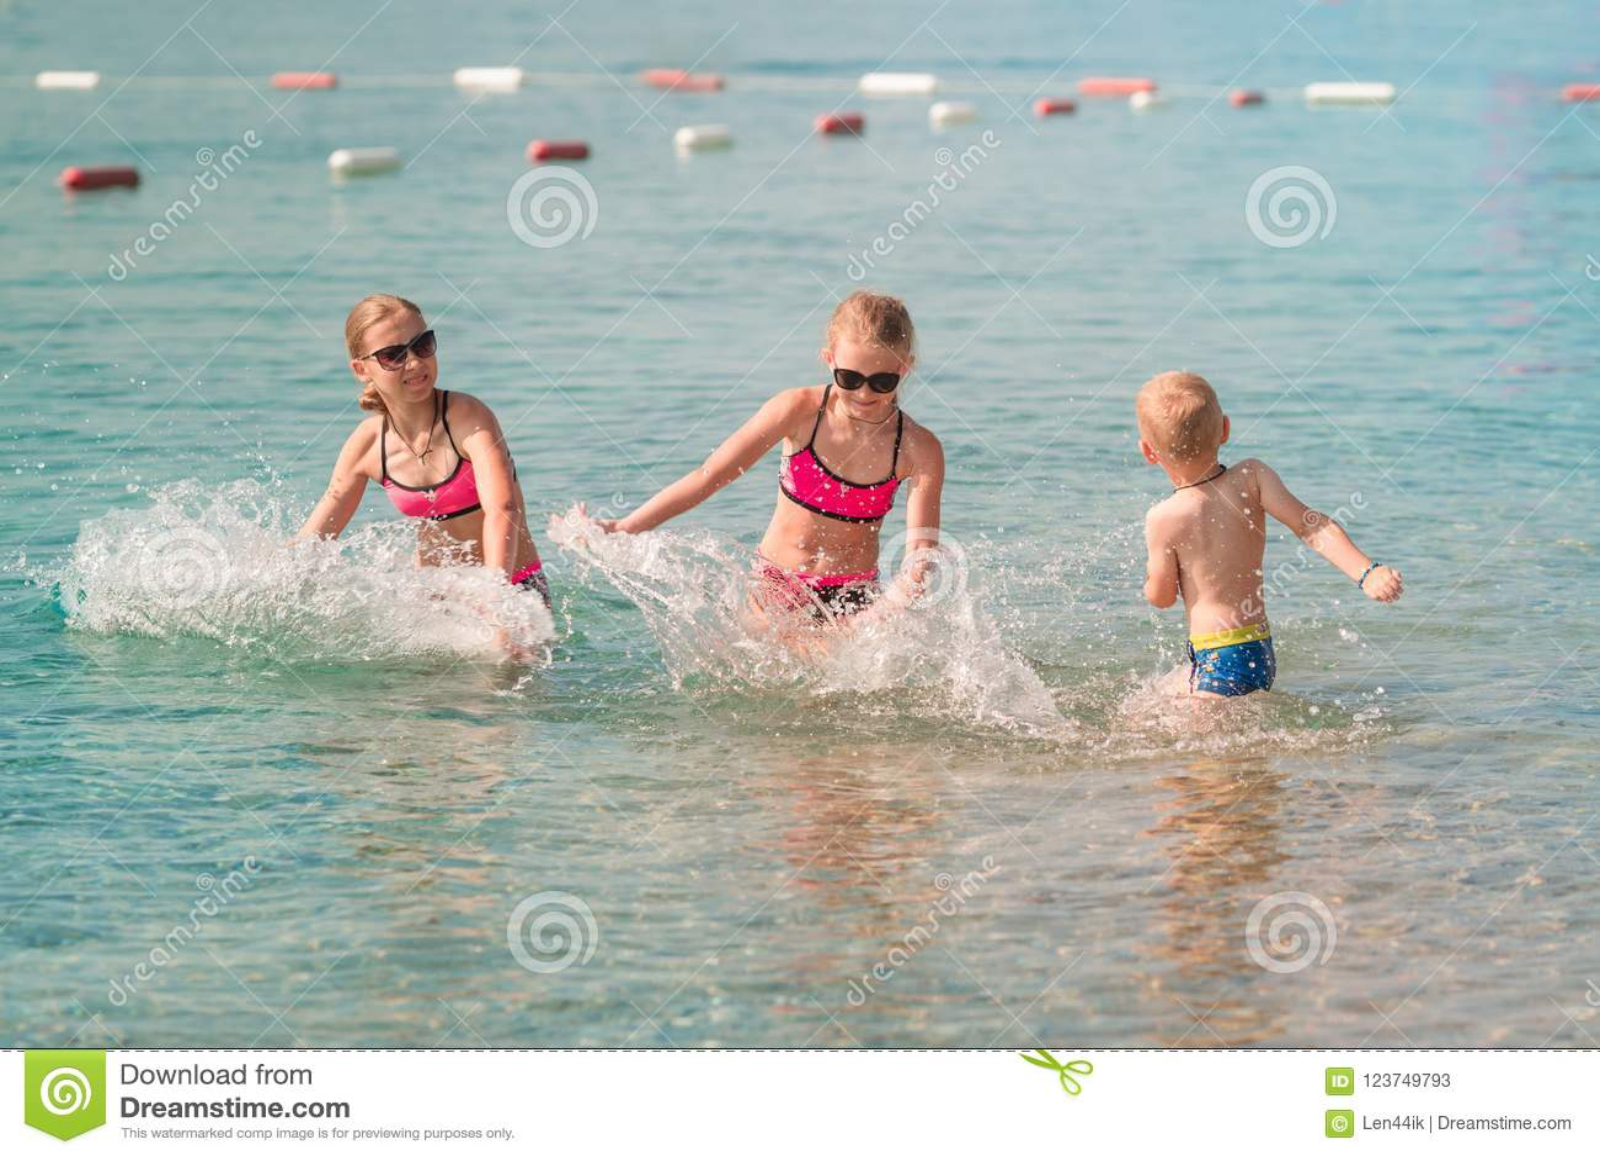 Kids having fun in the water at the seaside